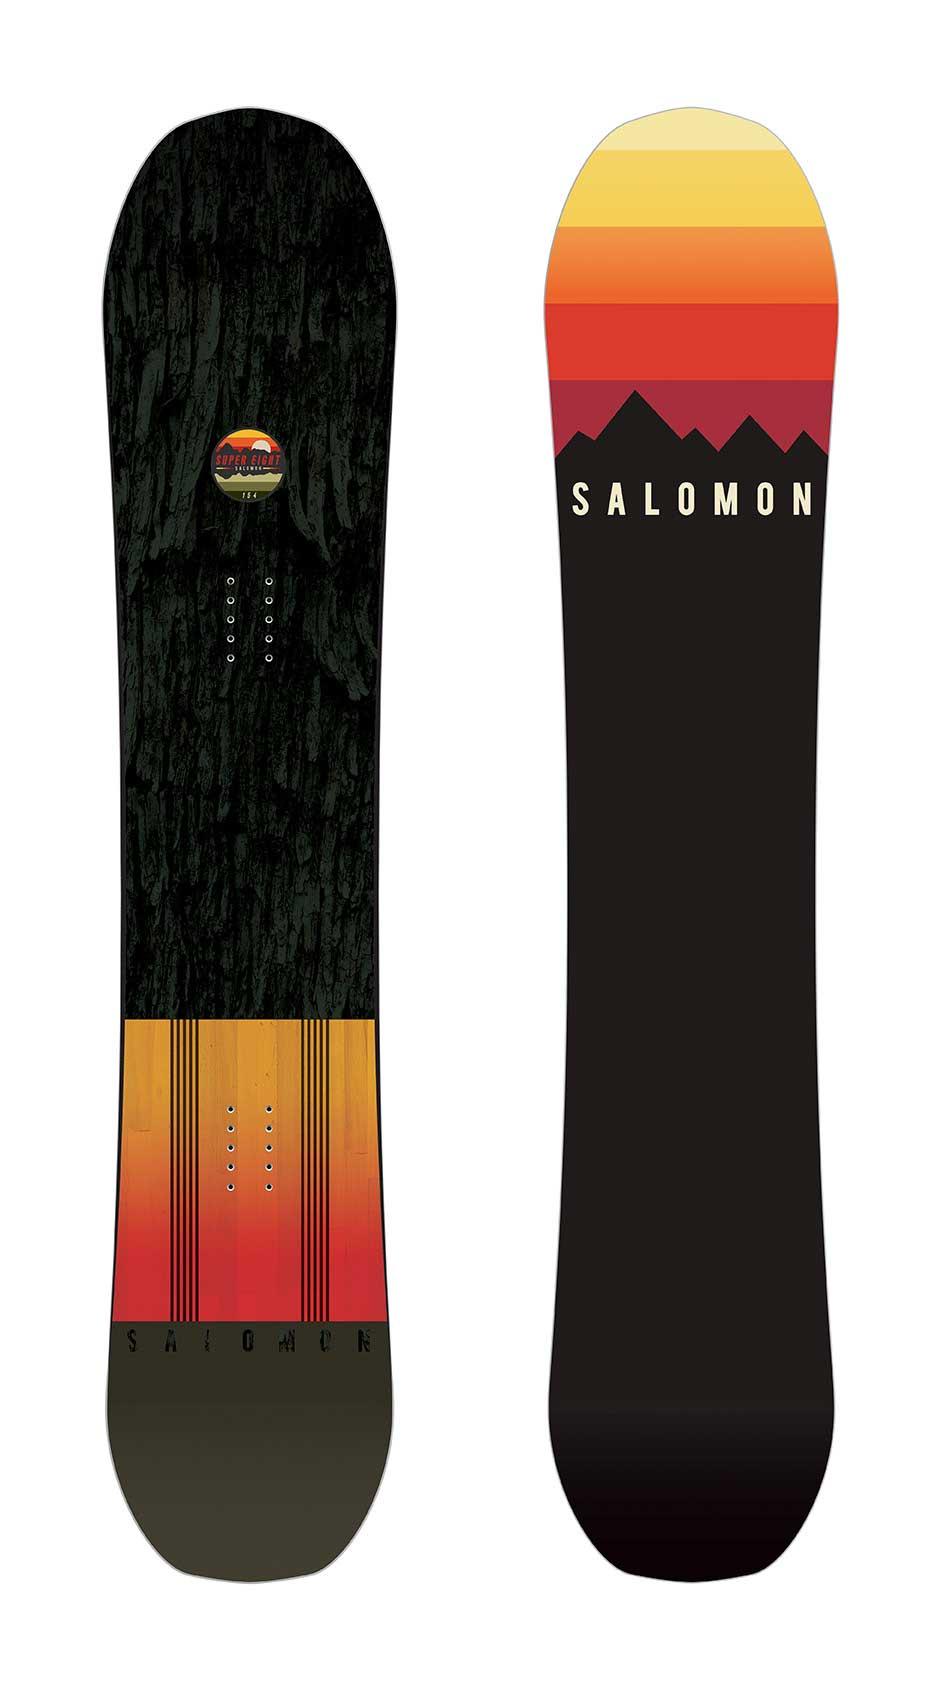 Salomon Super 8 Snowboard review